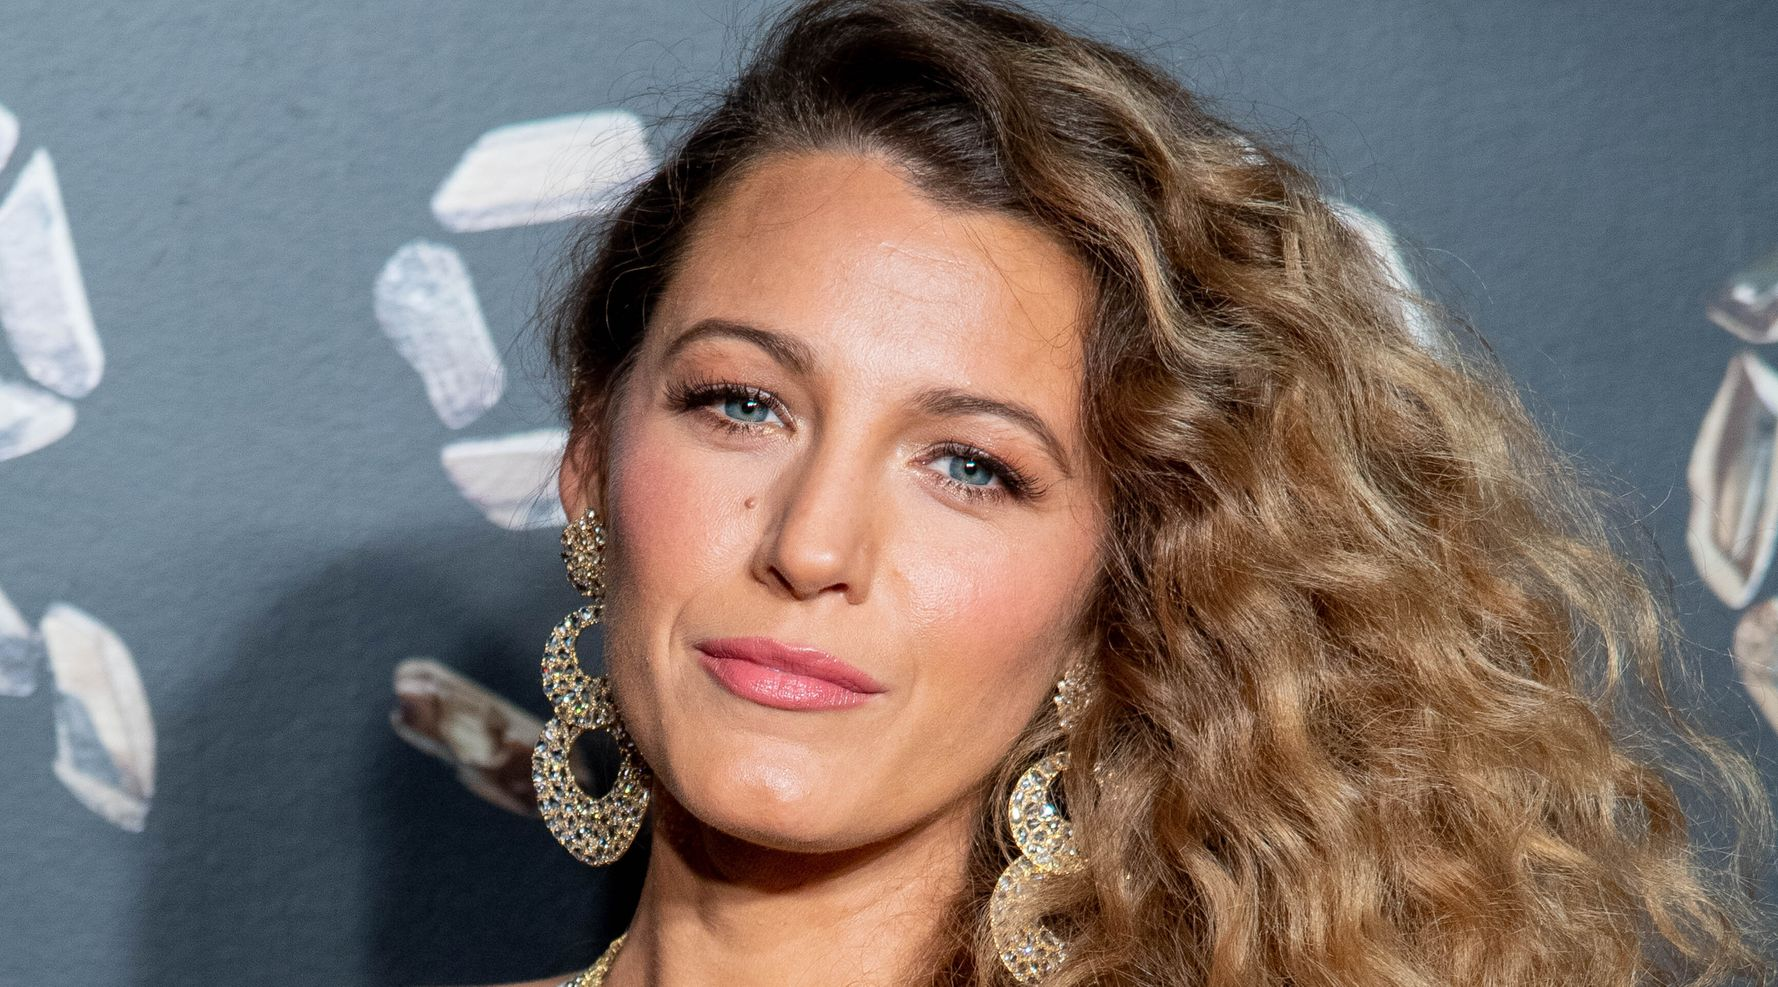 Blake Lively Reveals 'Frightening' Way Paparazzi Got Pics Of Her Kids